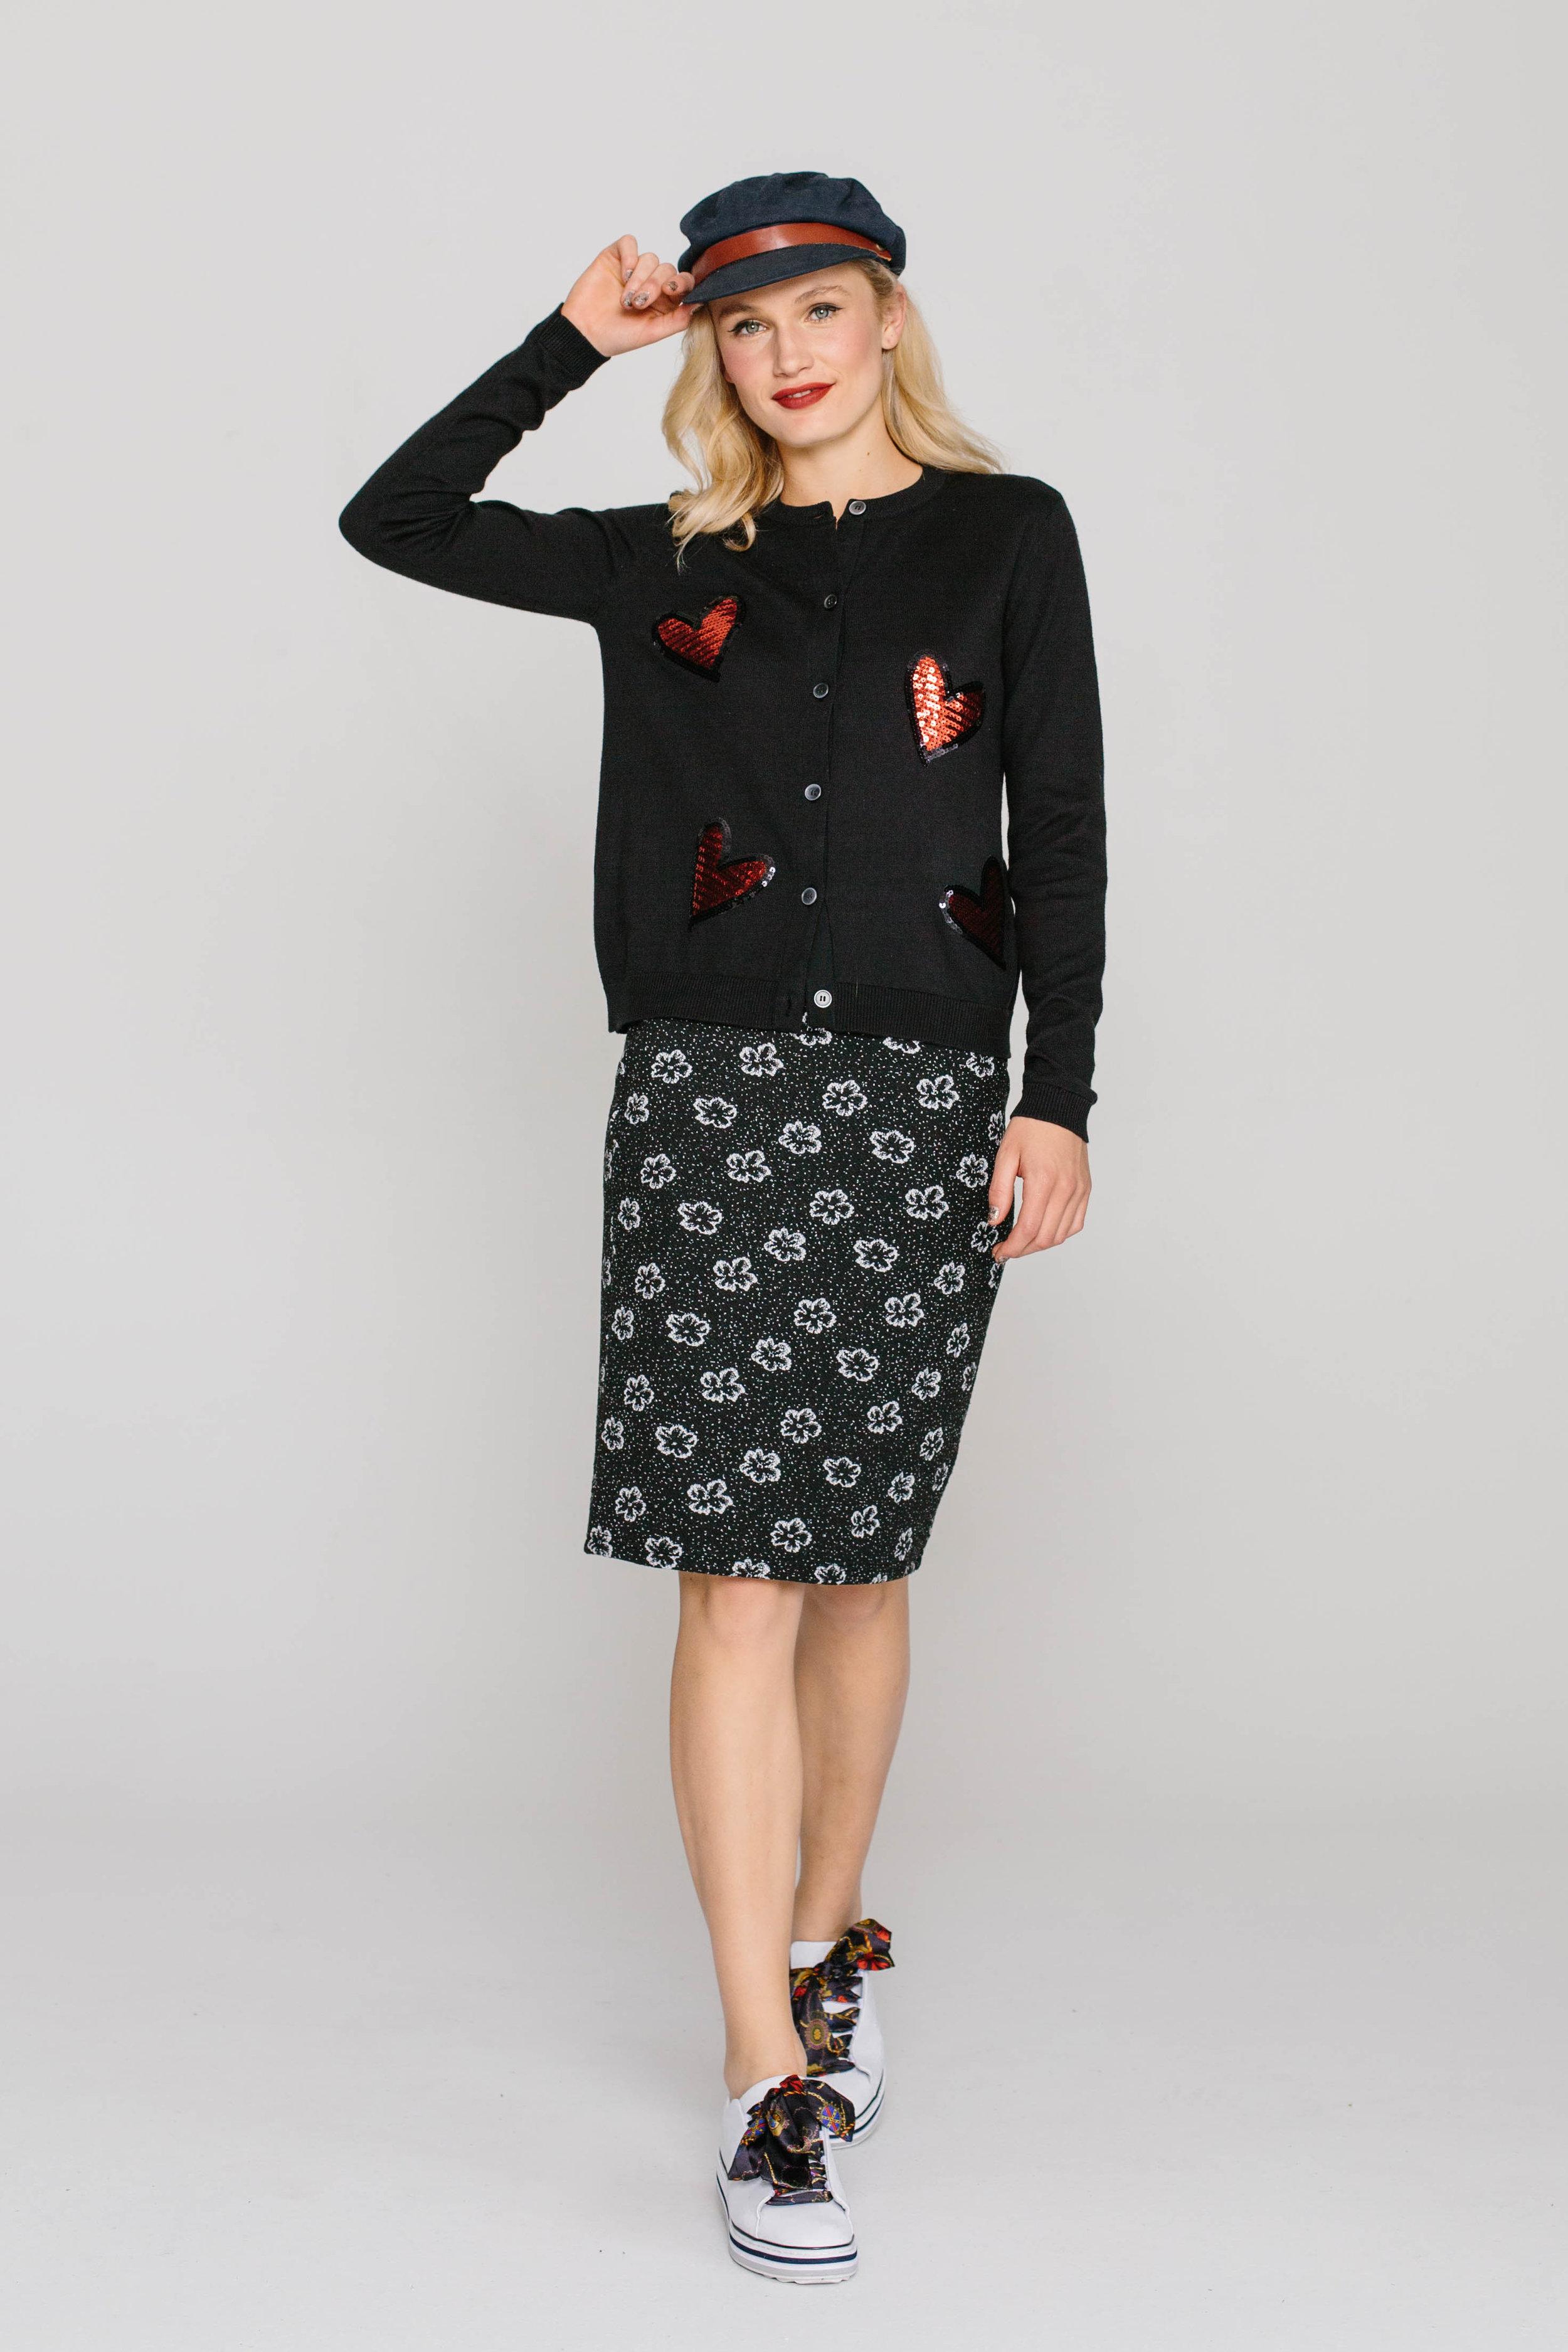 6198W Jewelled Cardi Love Hearts 4661W Skinny Skirt Black Sponge